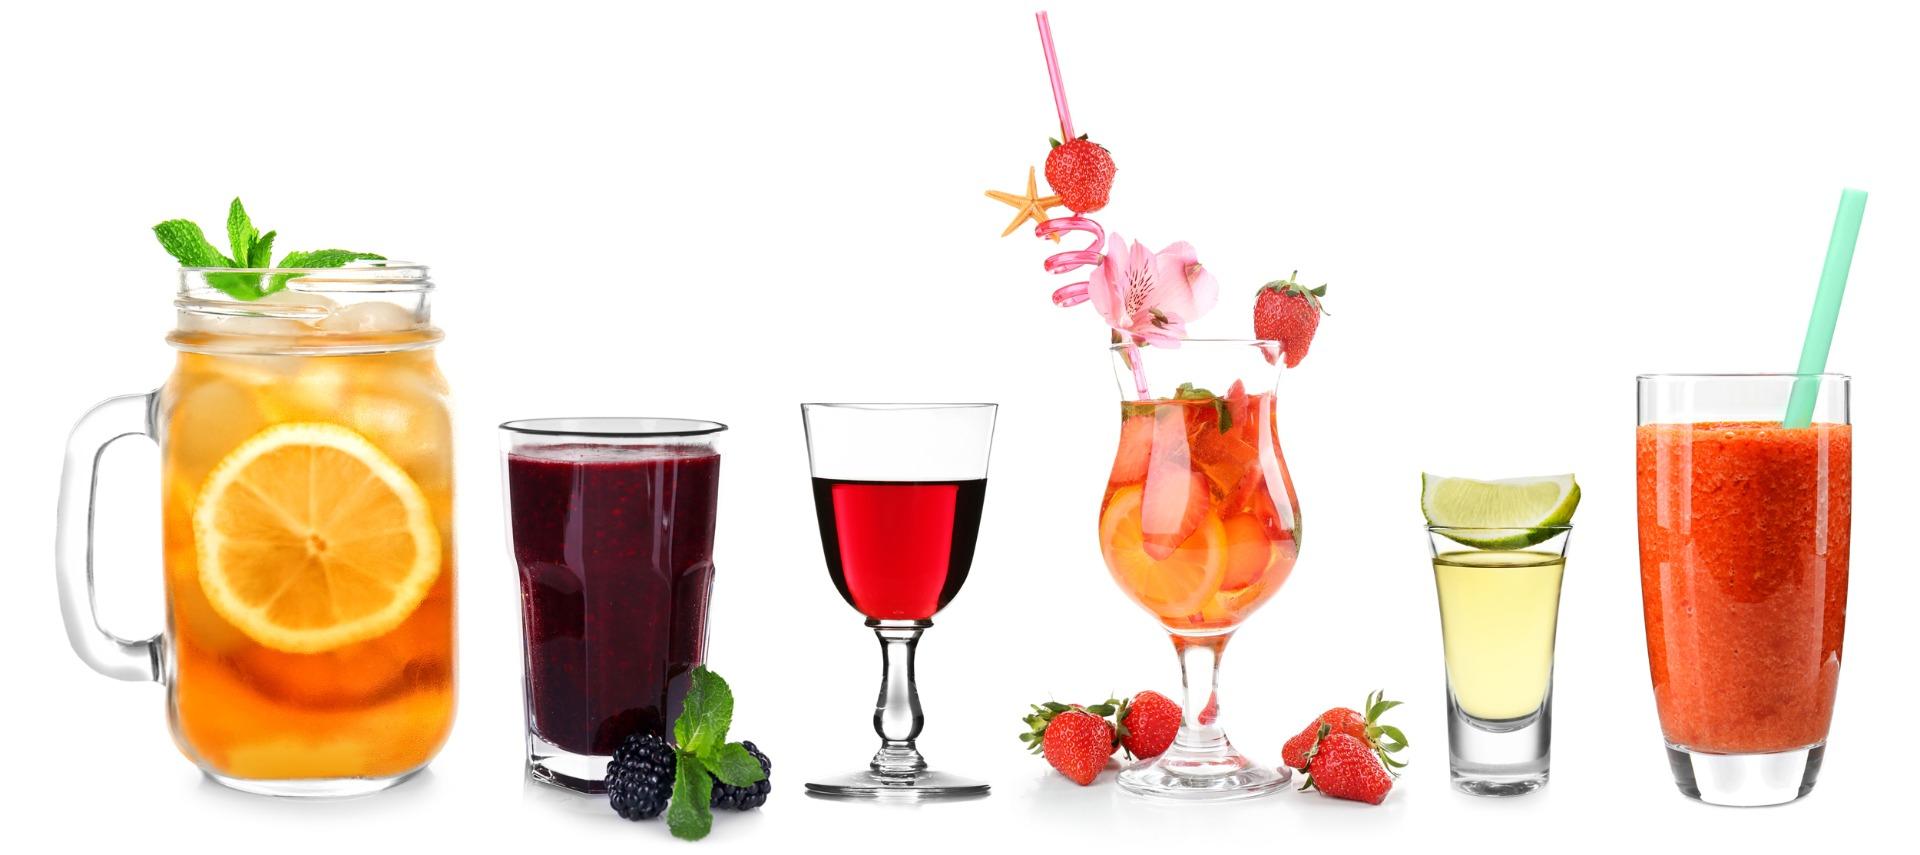 PrikenTik - Bartender - alcohol mythes 3